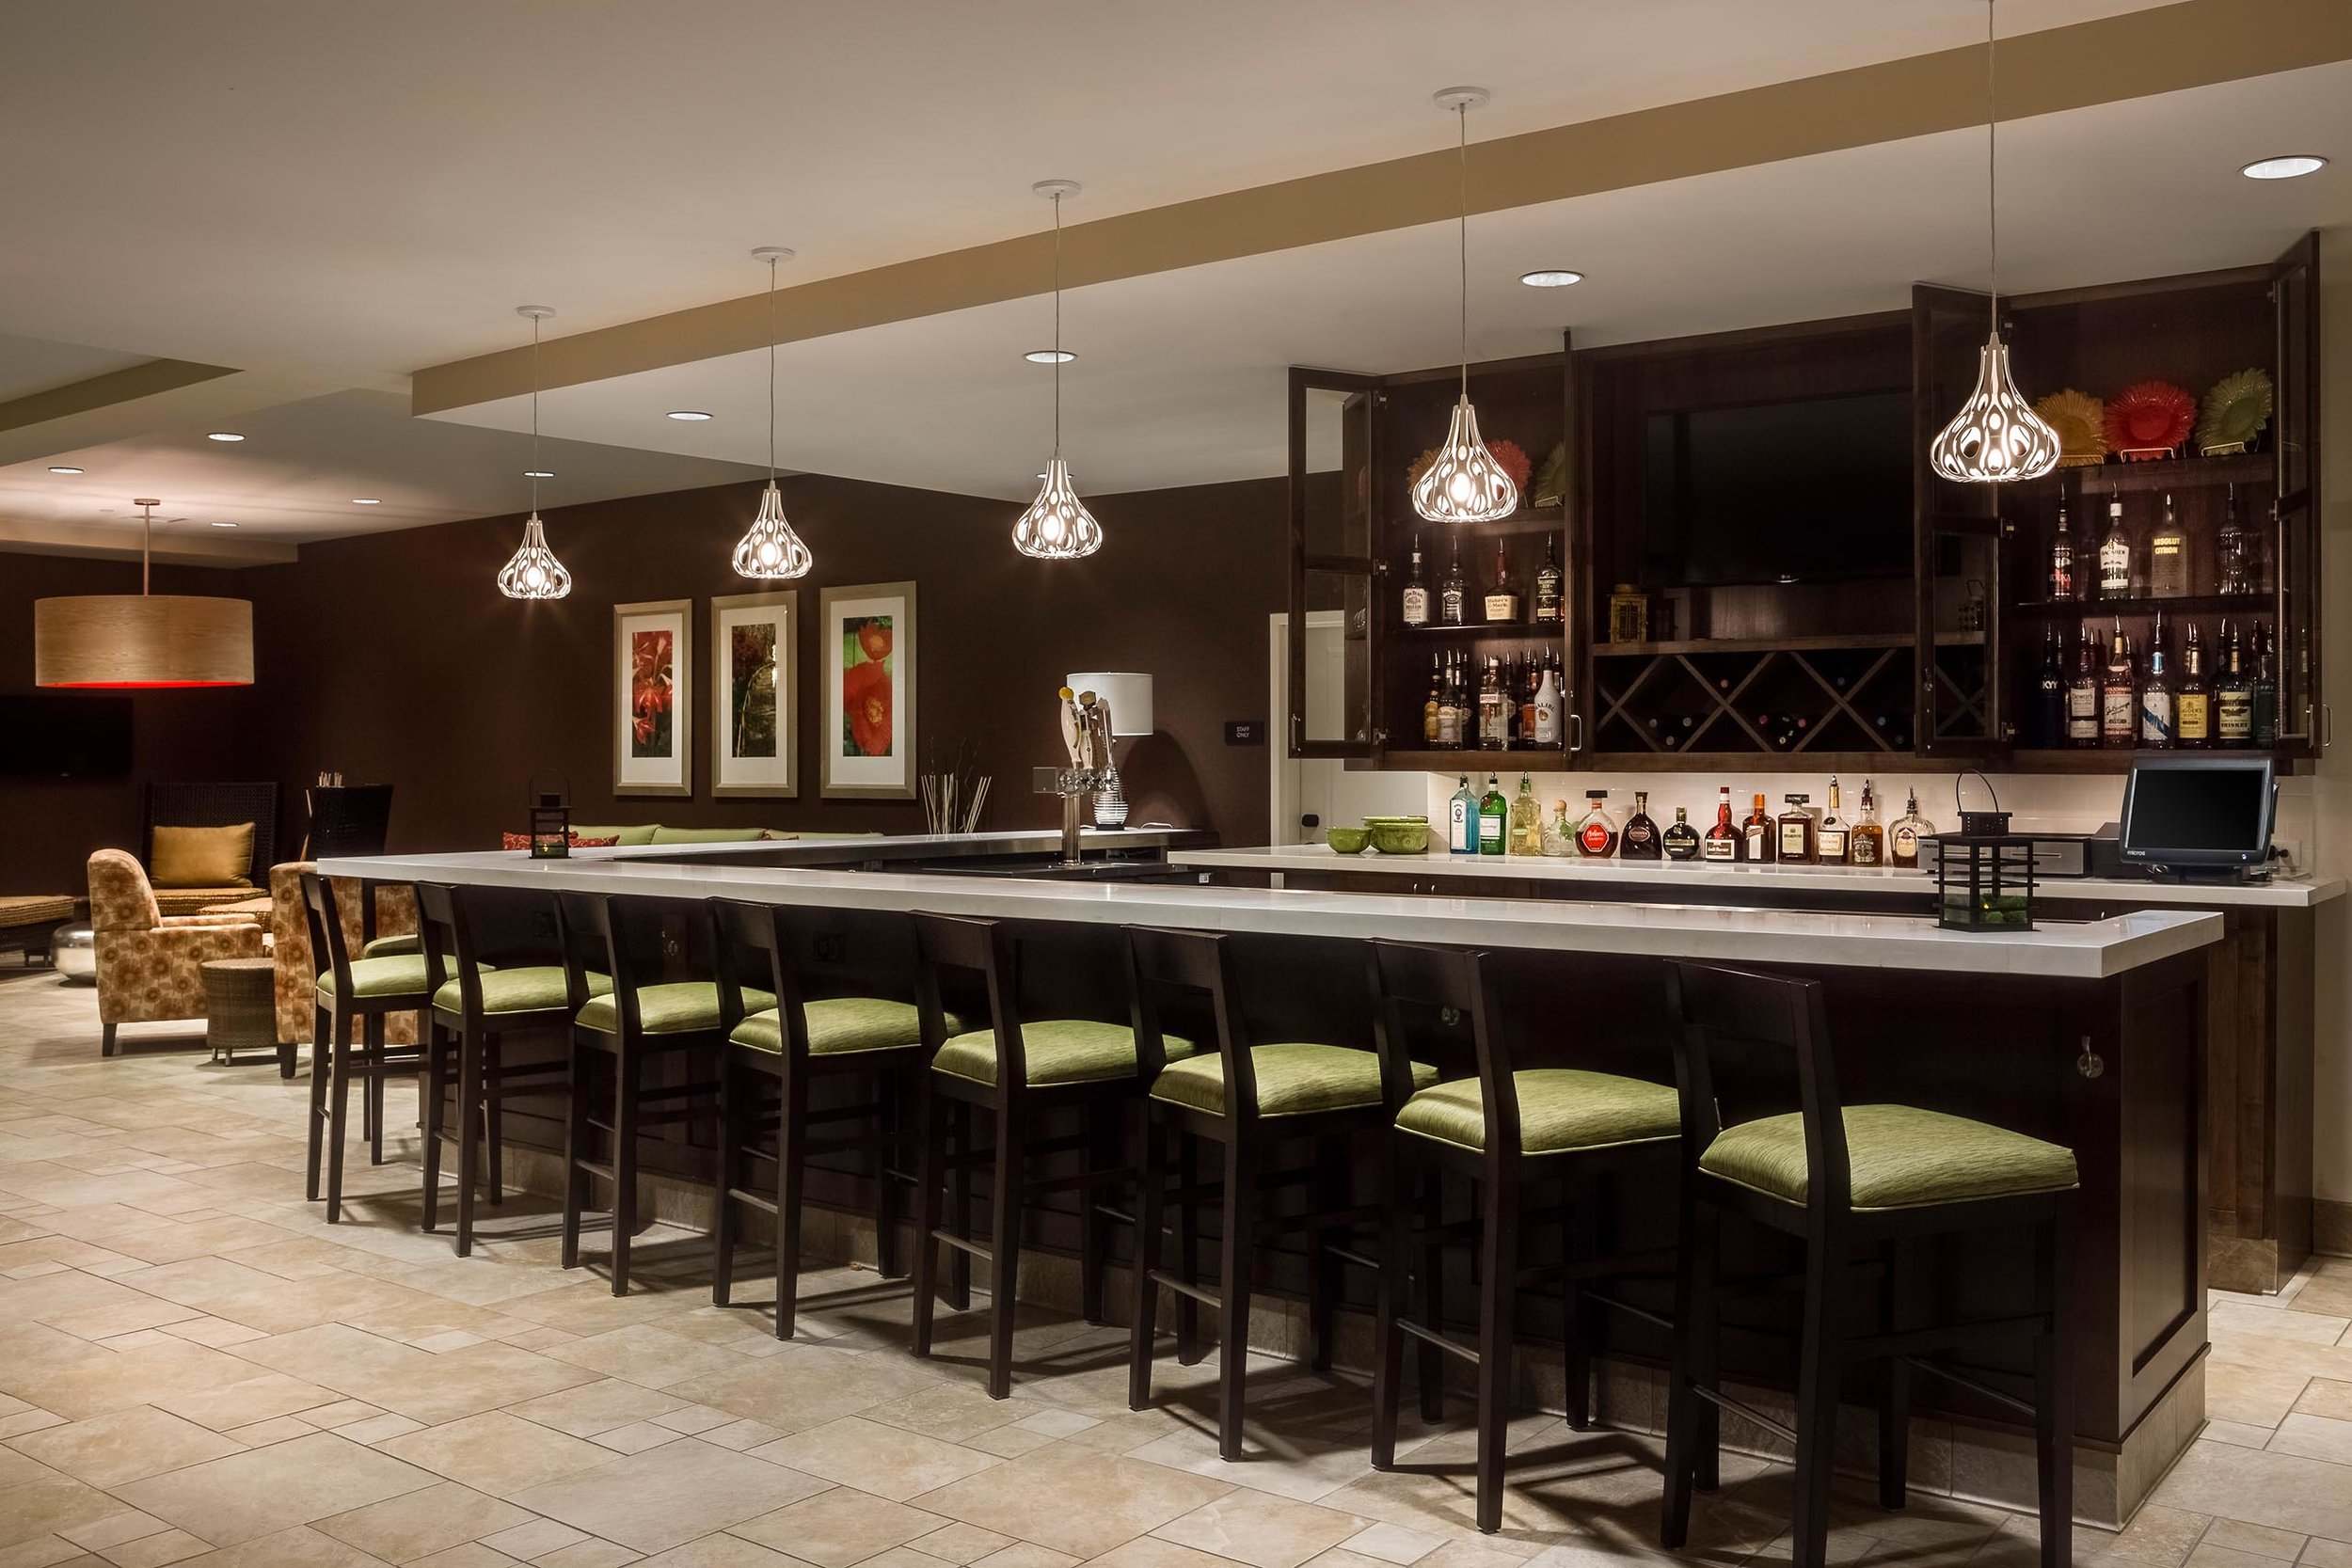 Bar area in Hilton Garden Inn in Bettendorf, IA